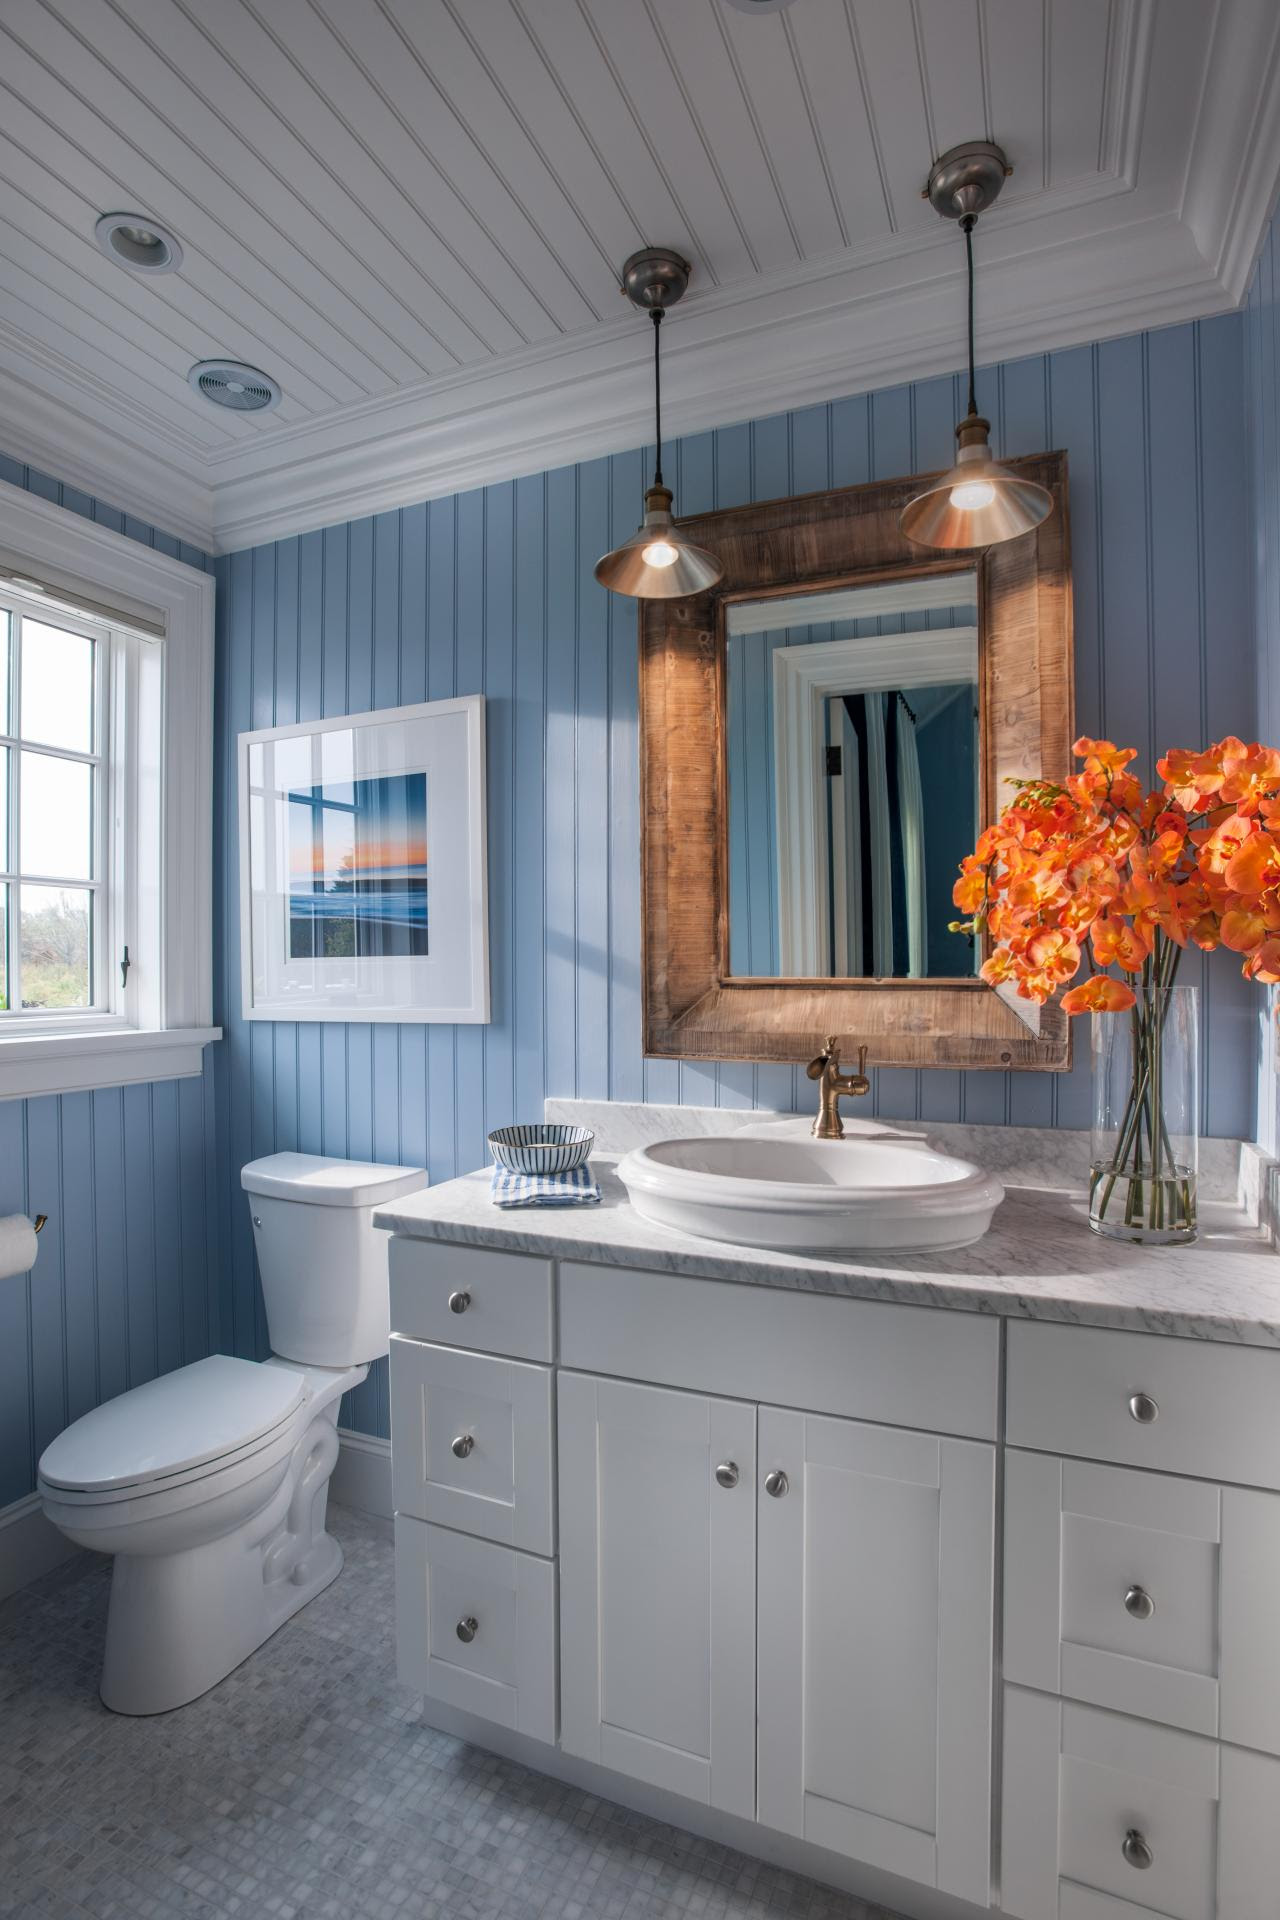 HGTV Dream Home 2015: Guest Bathroom | HGTV Dream Home ...